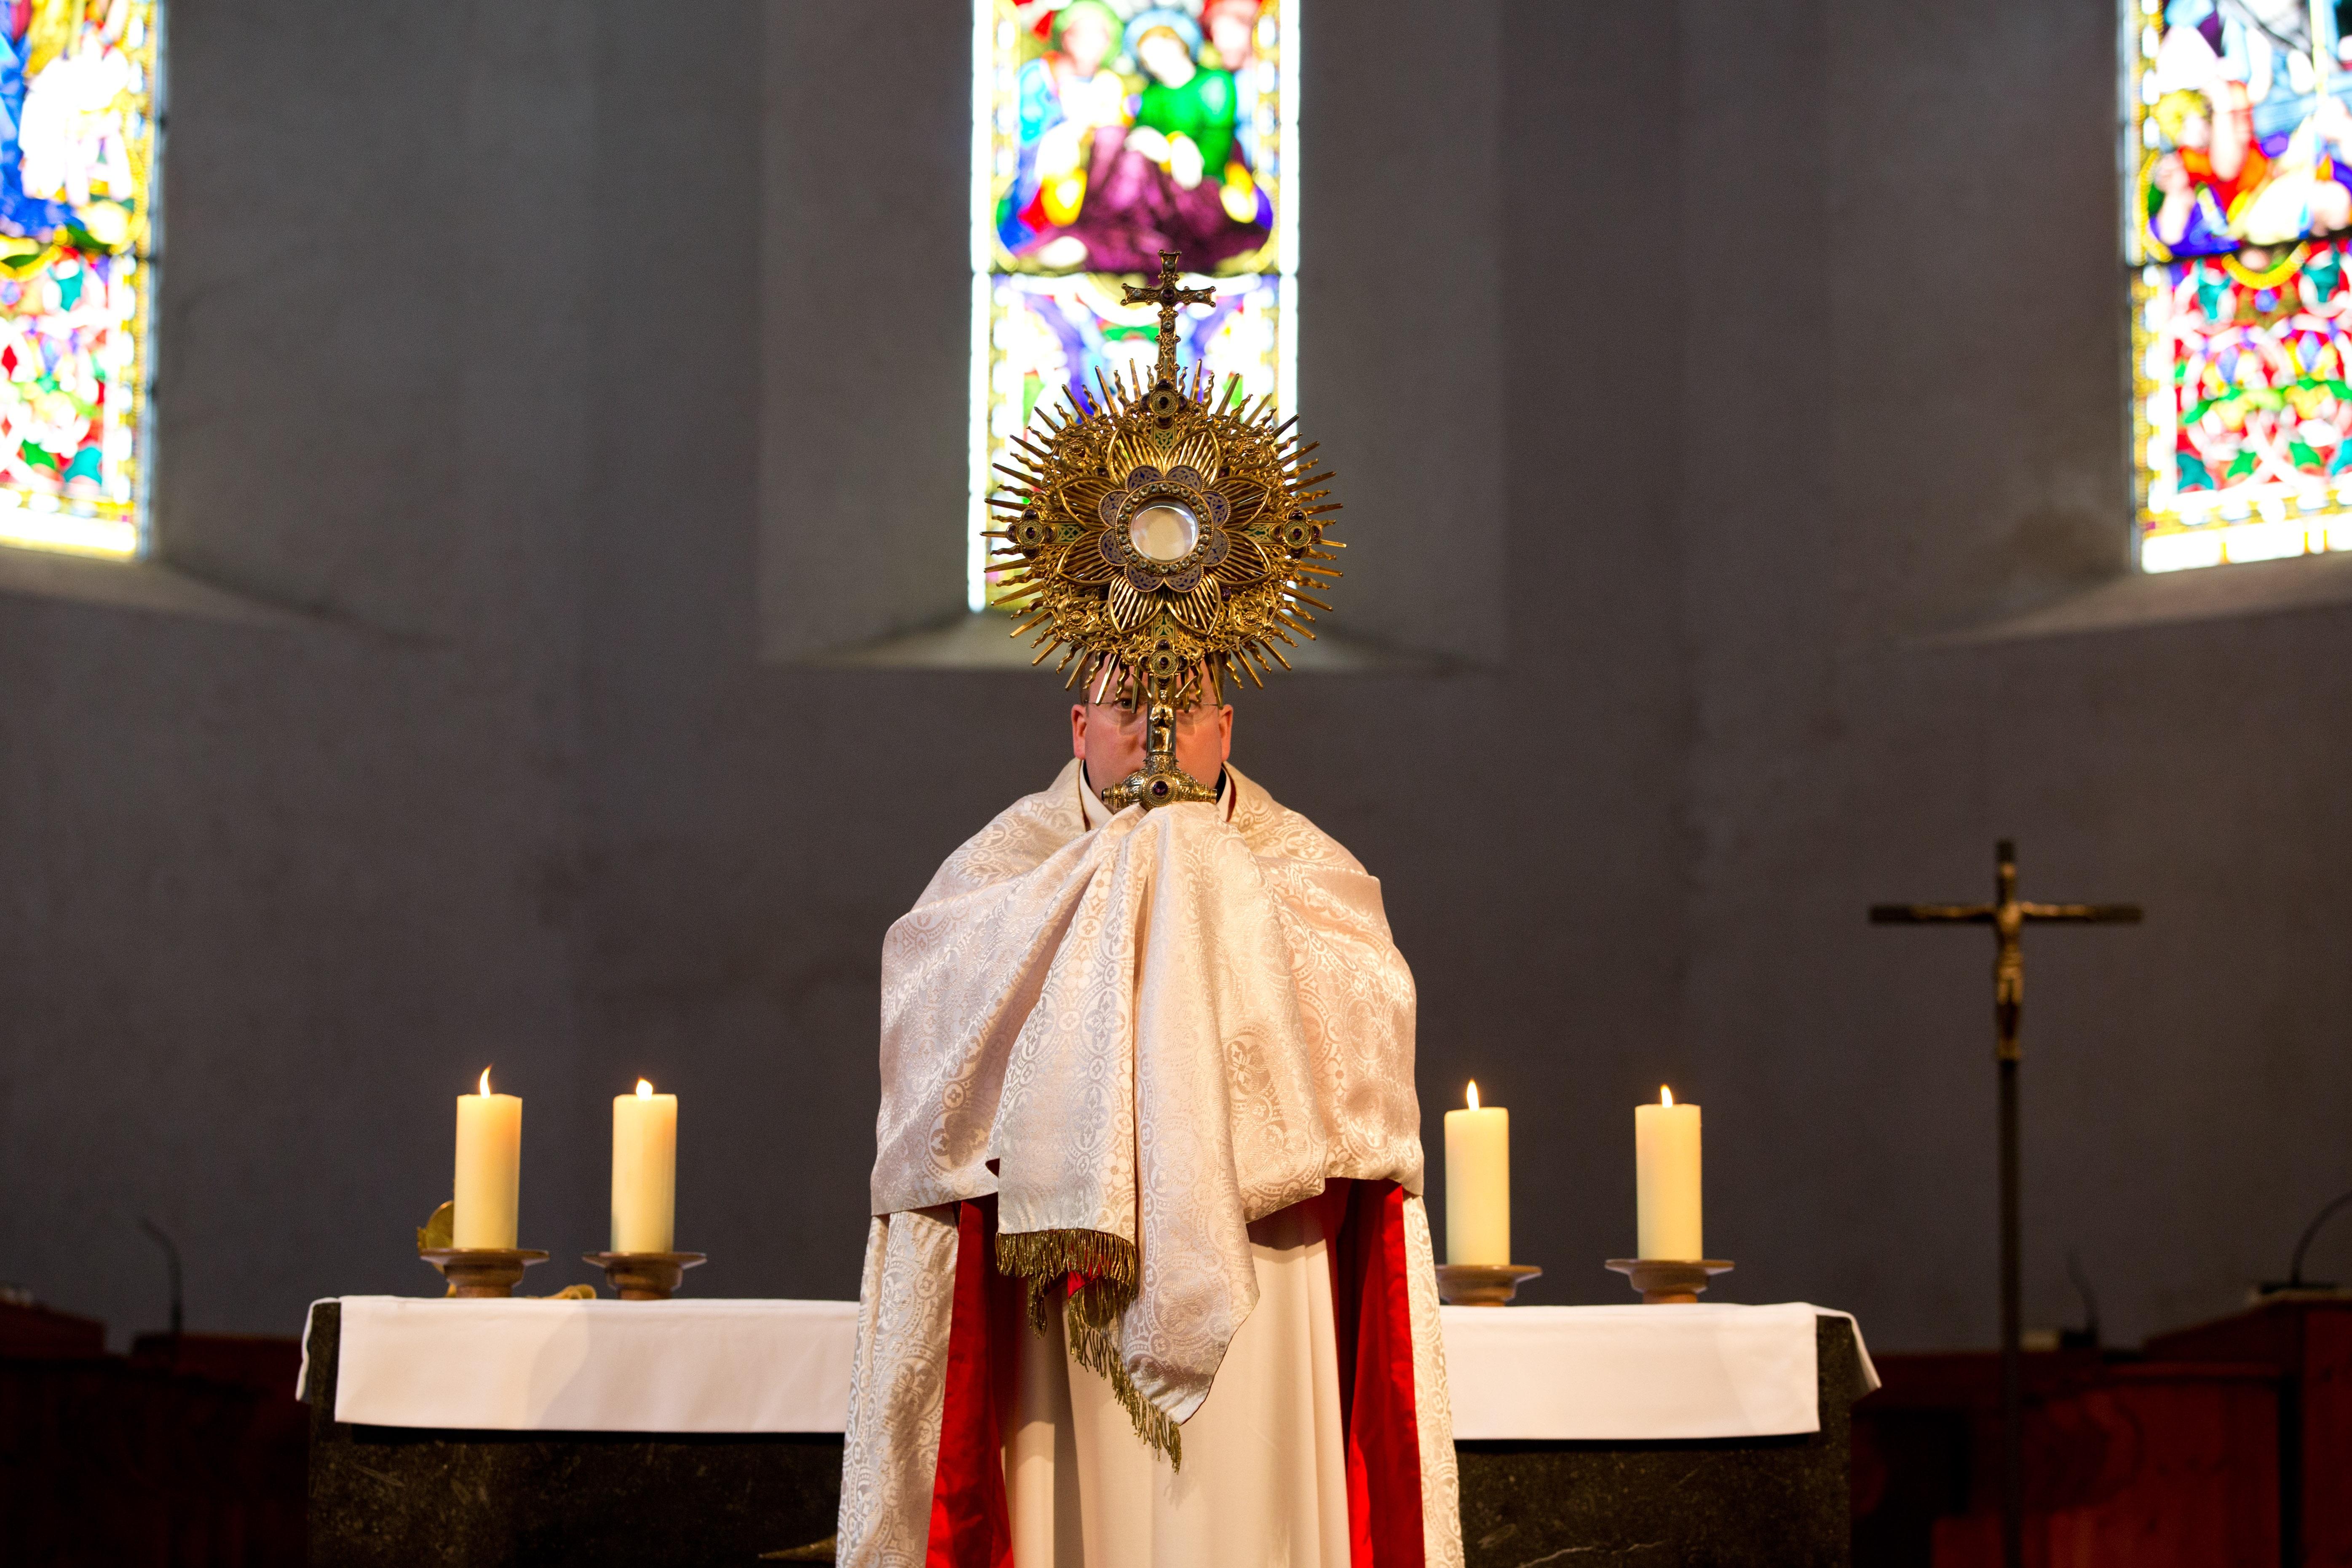 Mount Saint Joseph Abbey, Roscrea, County Tipperary. Picture: Sean Curtin.